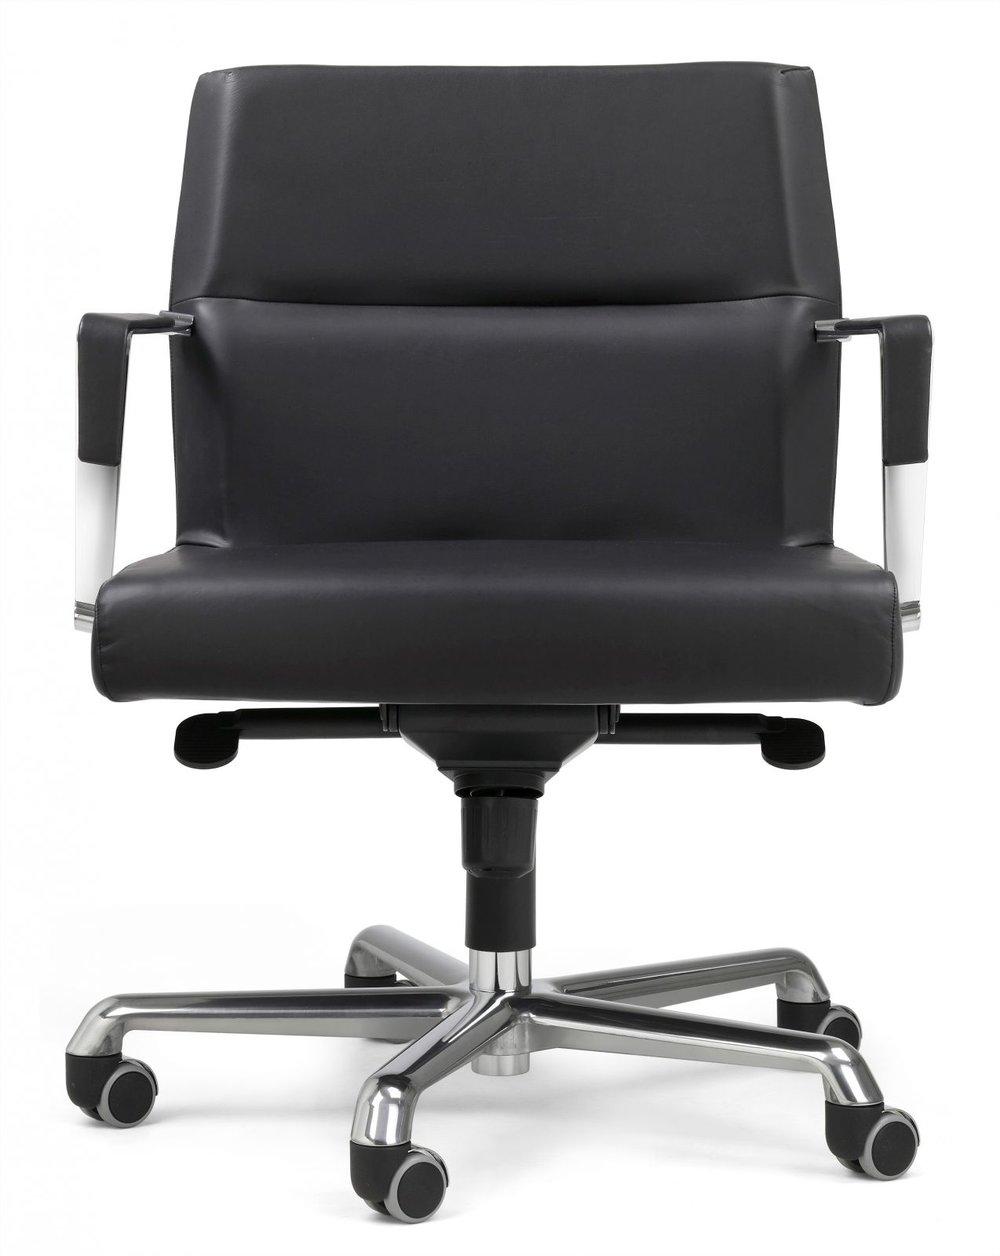 modern-office-chairs-Italian-furniture-designer-chairs (14).jpg